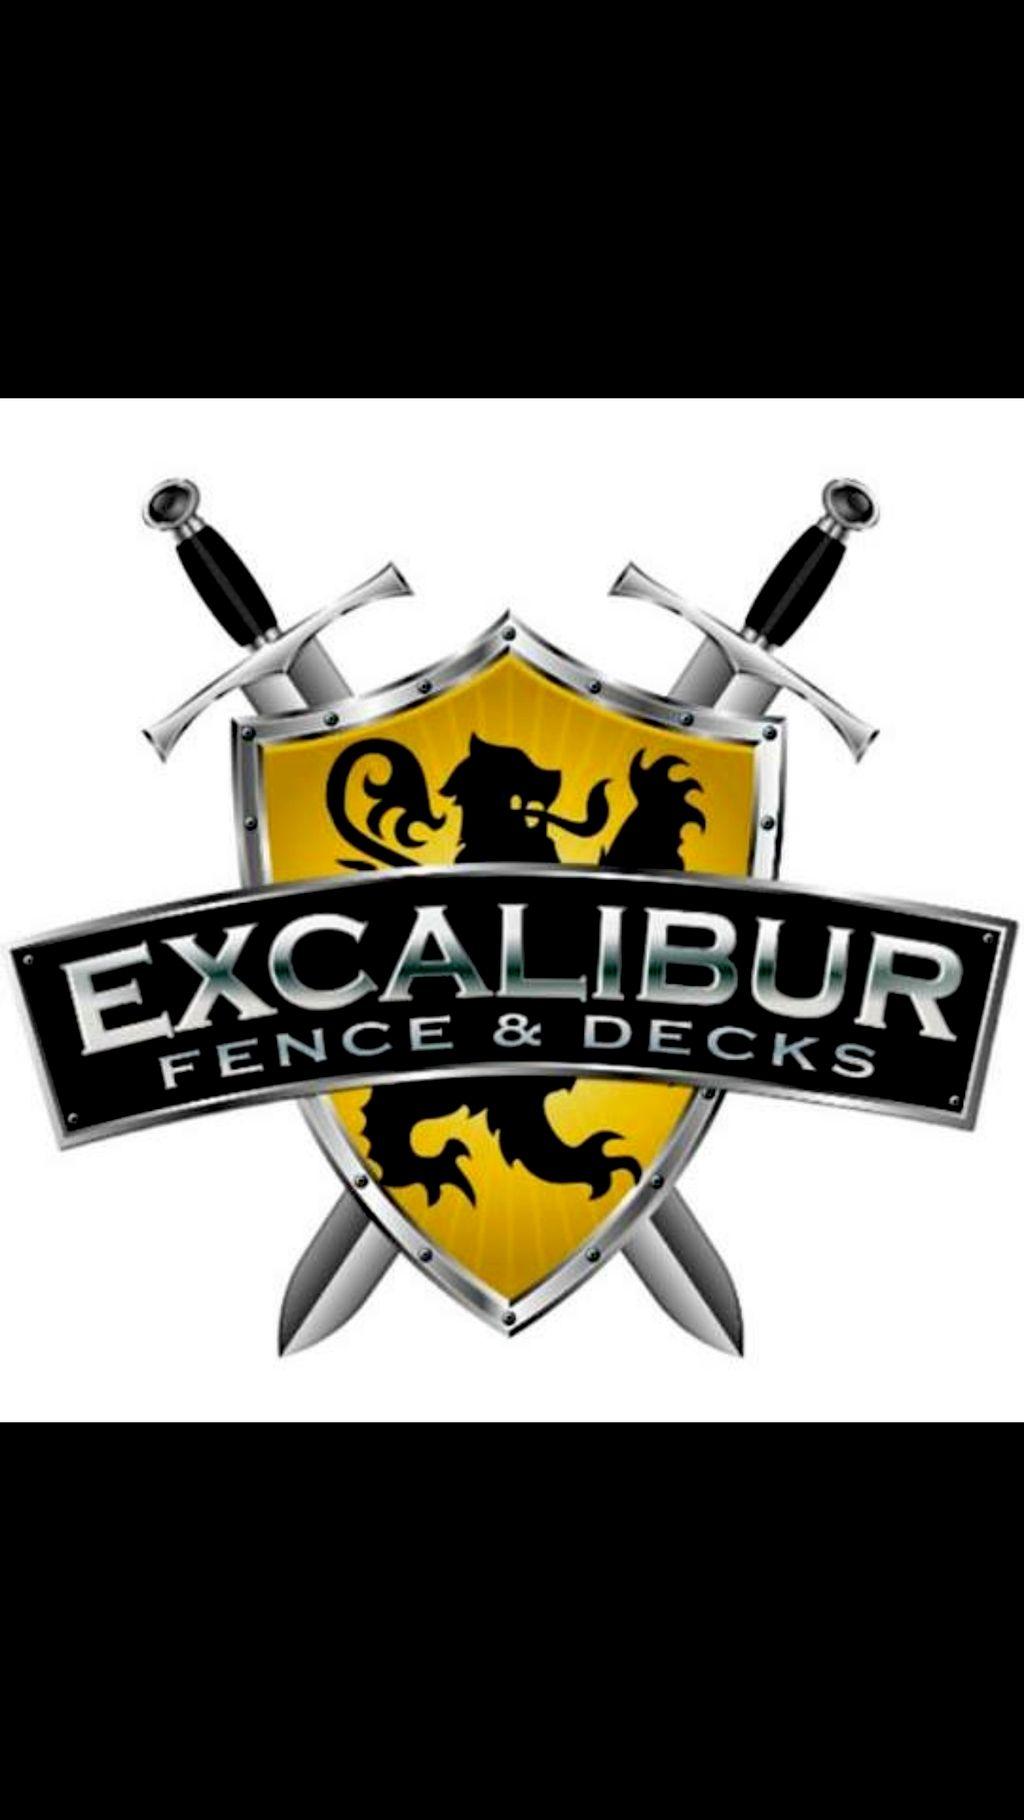 Excalibur Fence And Decks